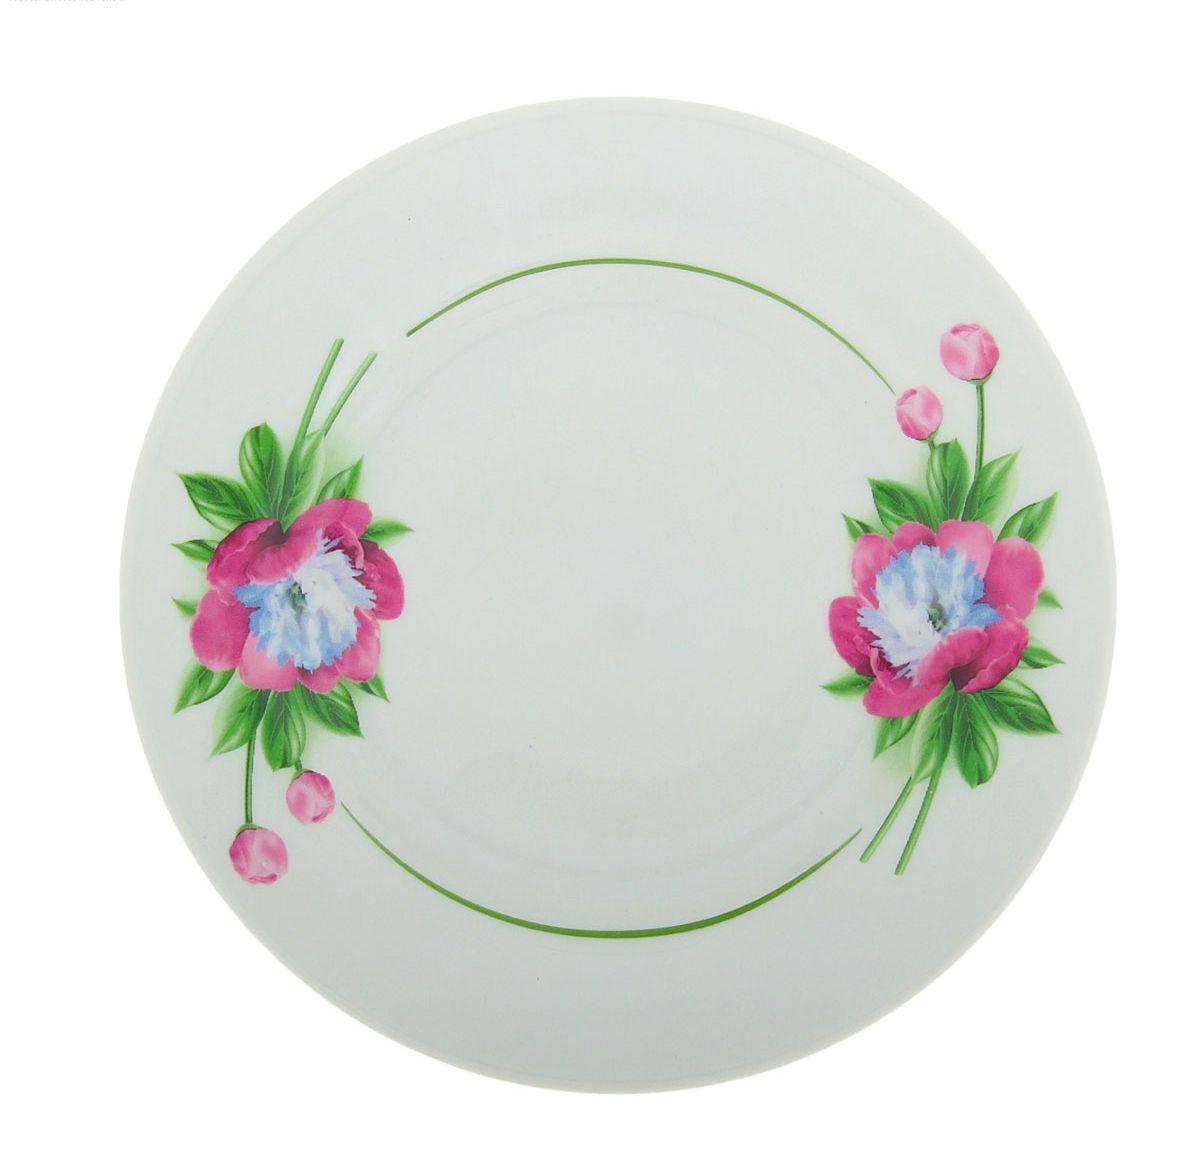 Тарелка мелкая Идиллия. Пион, диаметр 17 см. 507733507733